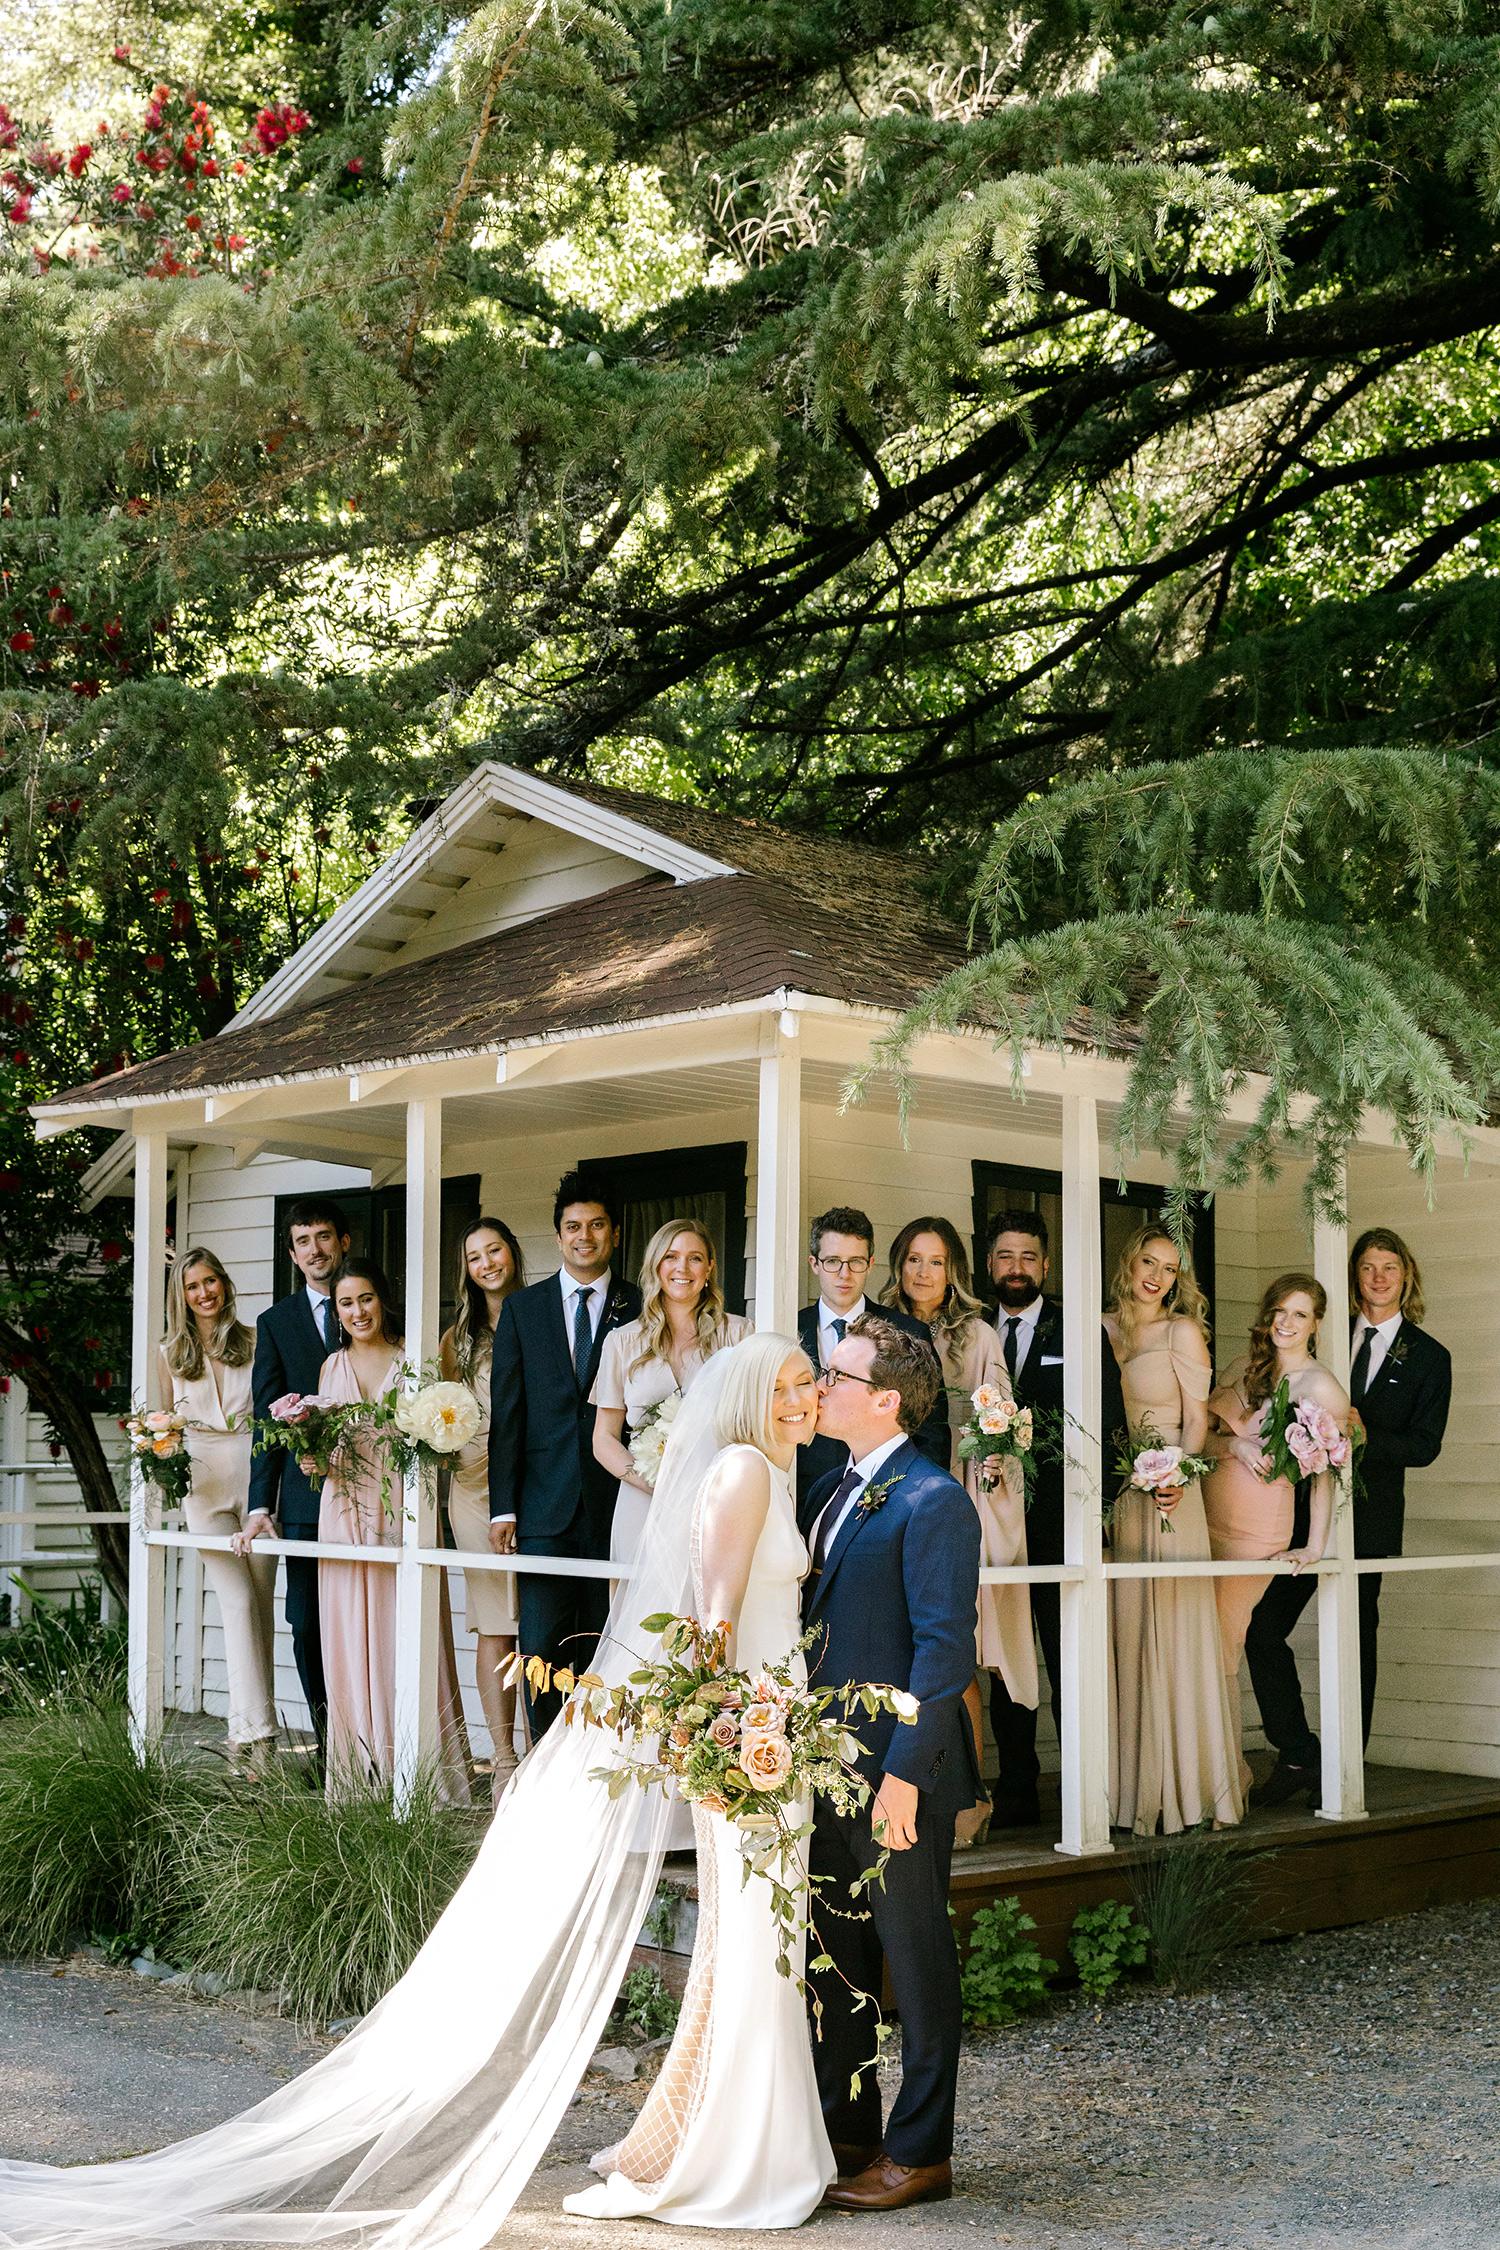 kendall jackson wedding couple and wedding party